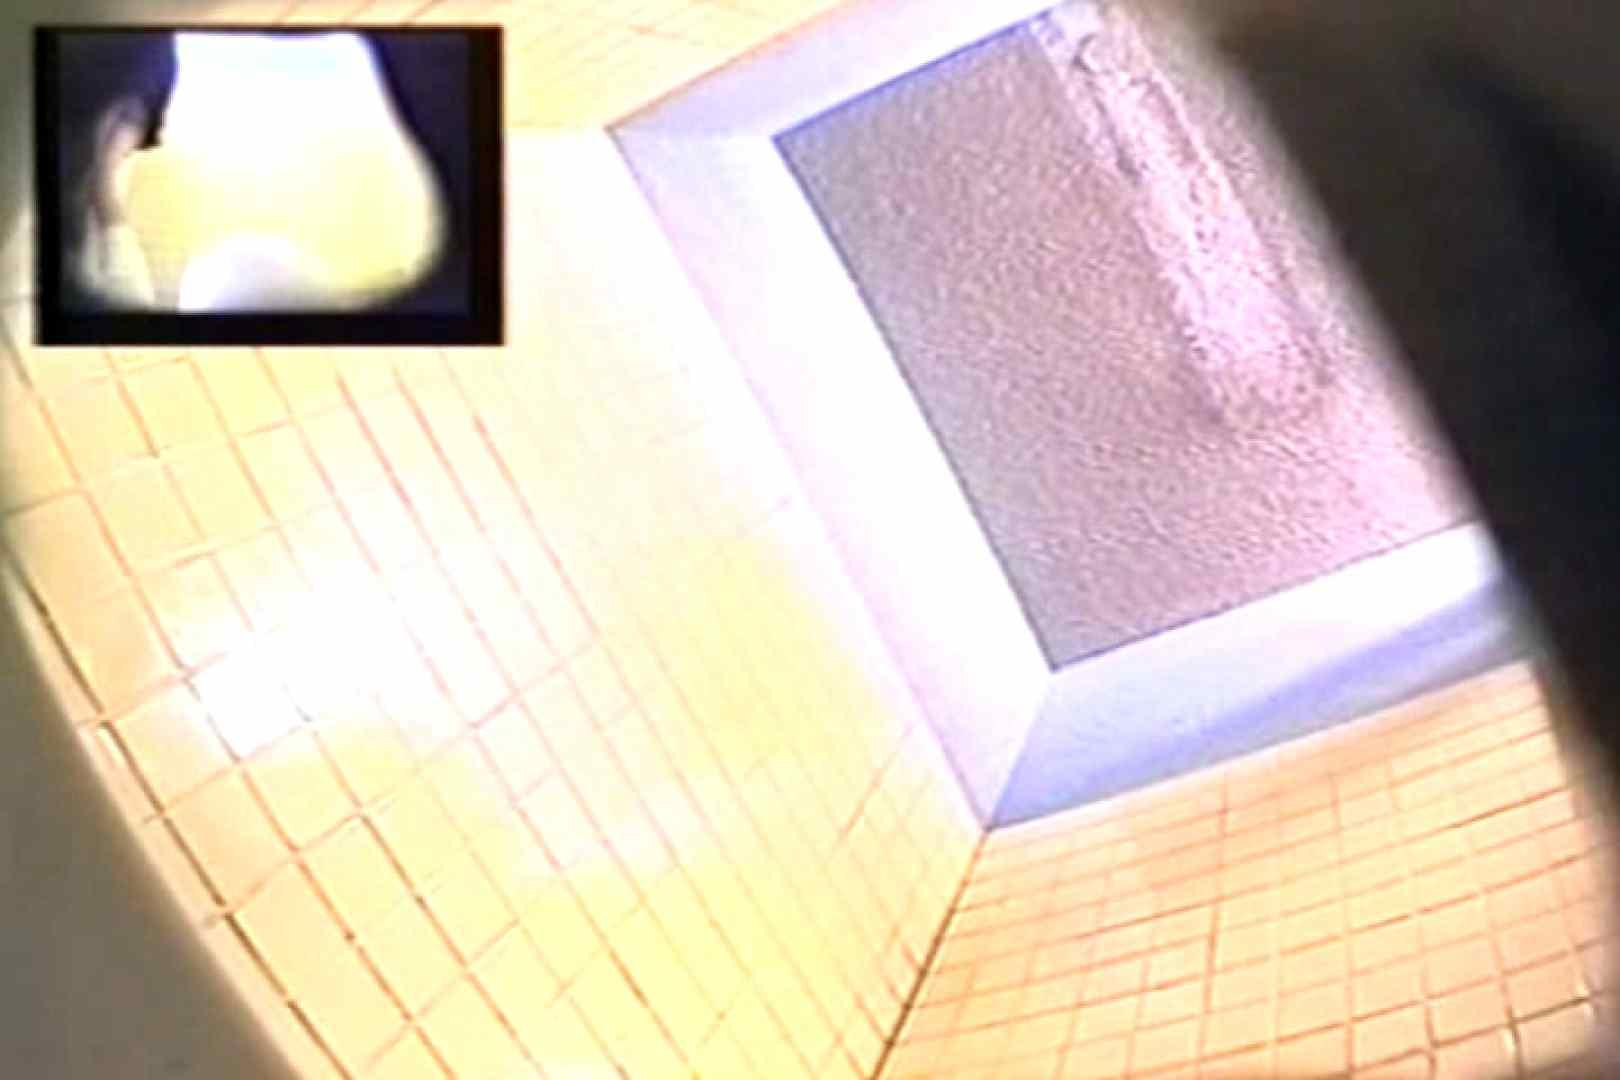 下半身シースルー洗面所Vol.1 洗面所突入 オメコ無修正動画無料 101pic 88